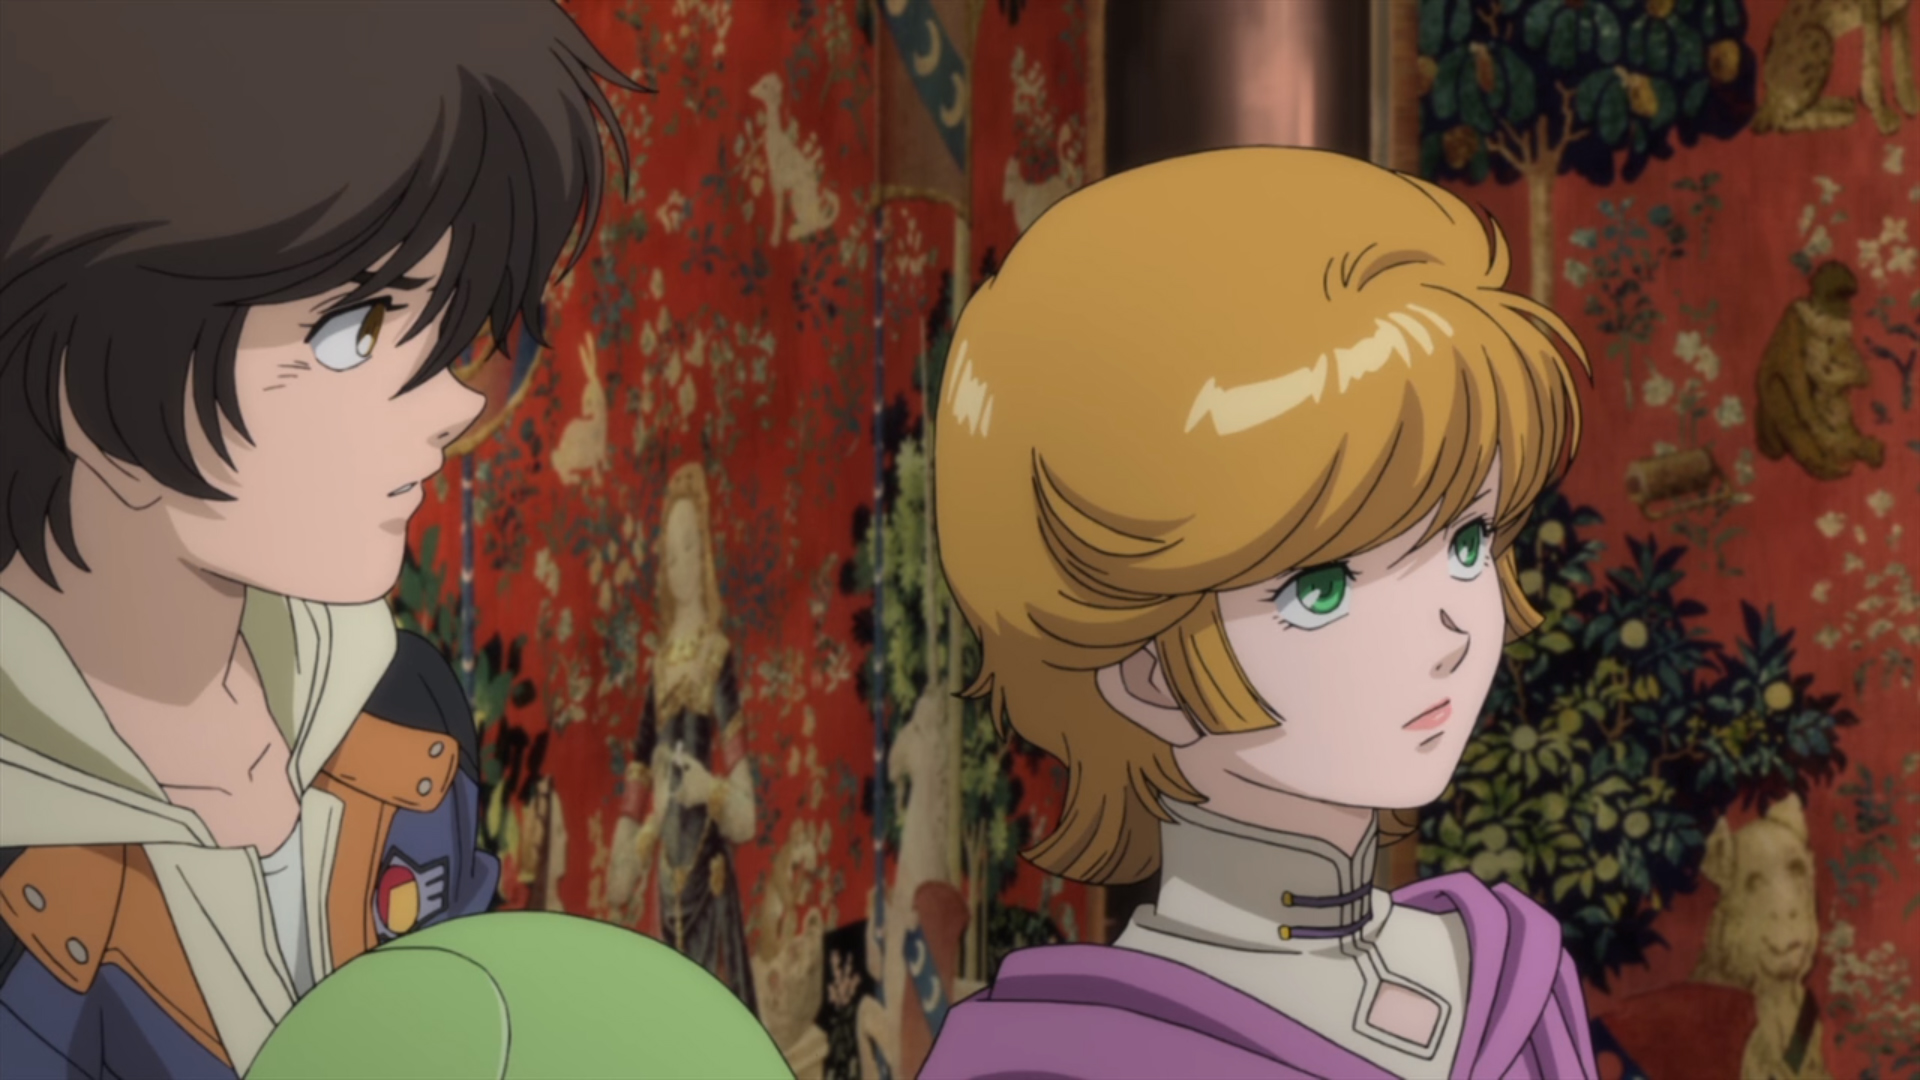 Crítica do Mobile Suit Gundam Unicorn 2